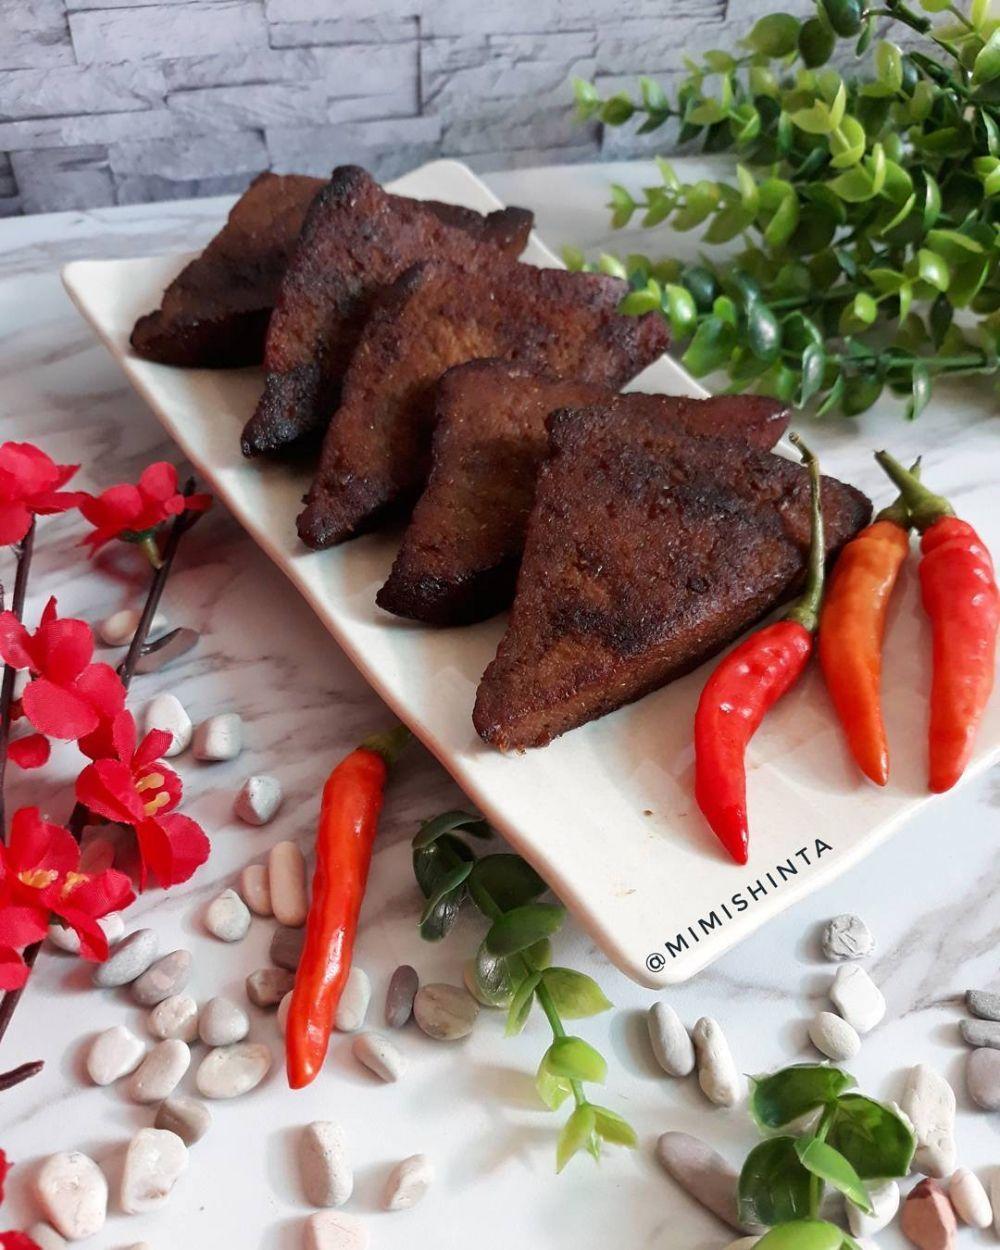 Resep Aneka Bacem Instagram Dhina Kesumawati Foodishpedia Di 2020 Resep Resep Masakan Resep Makanan